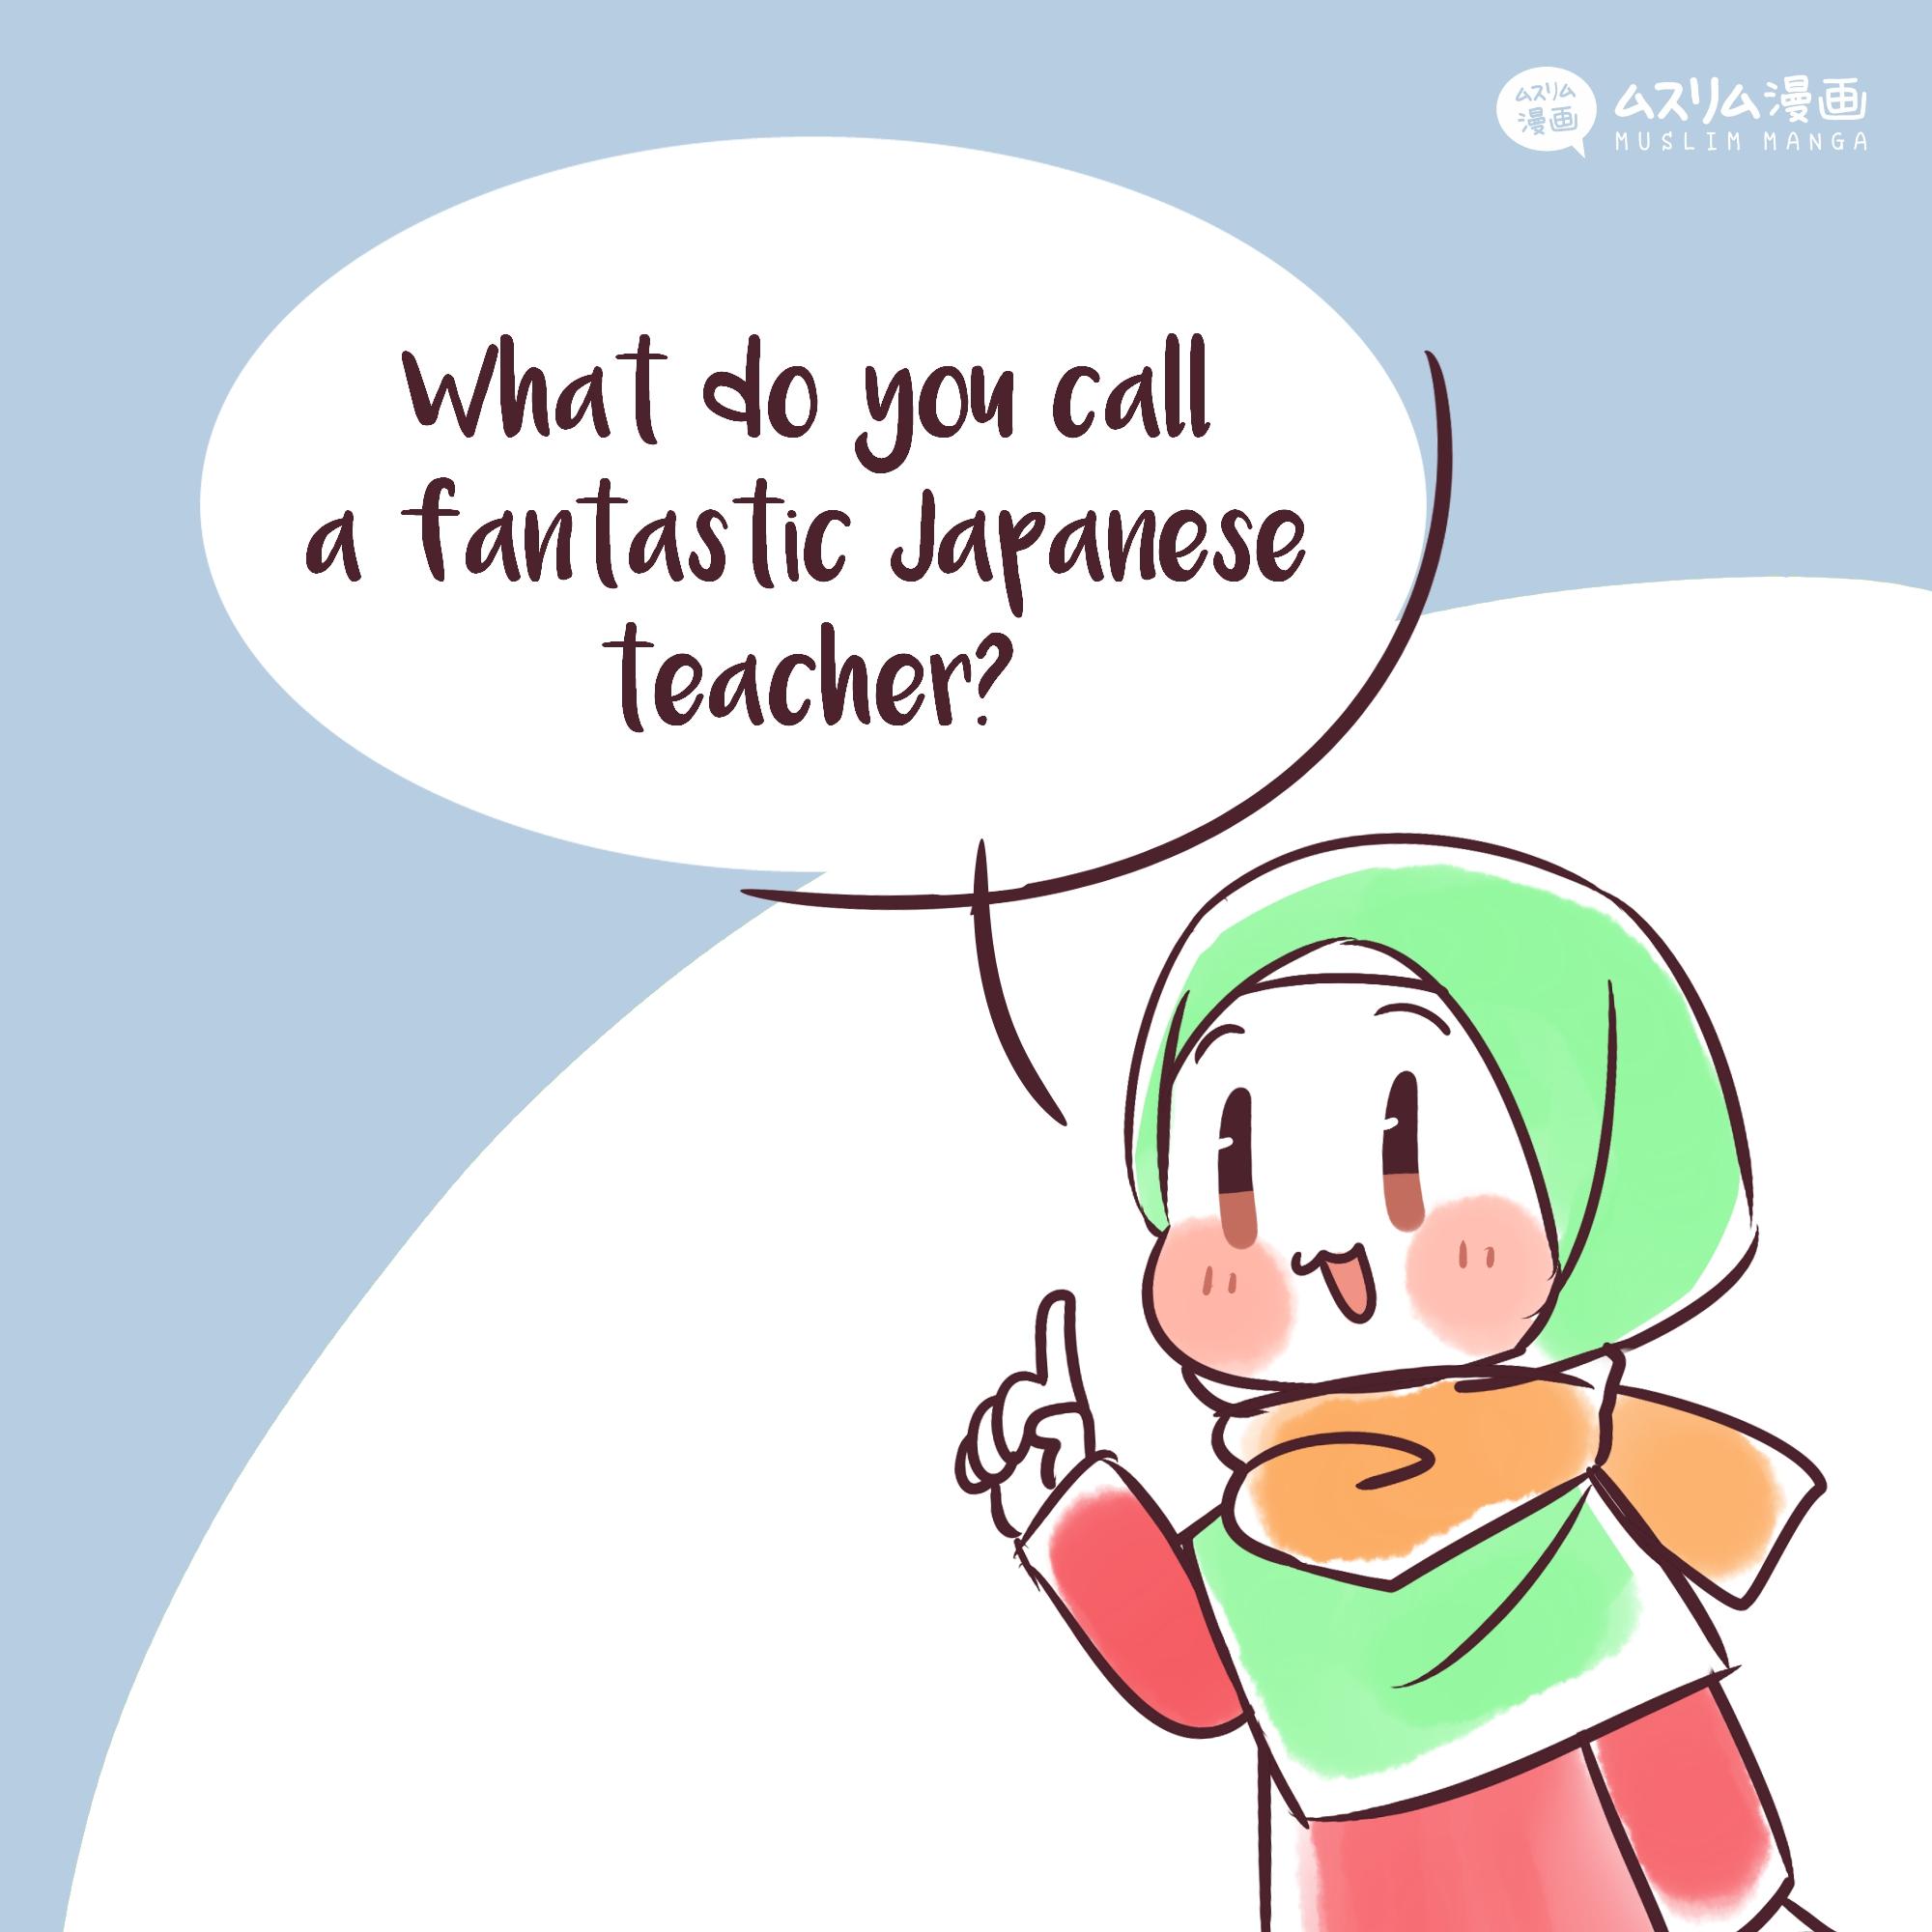 fun puns: sensei 1